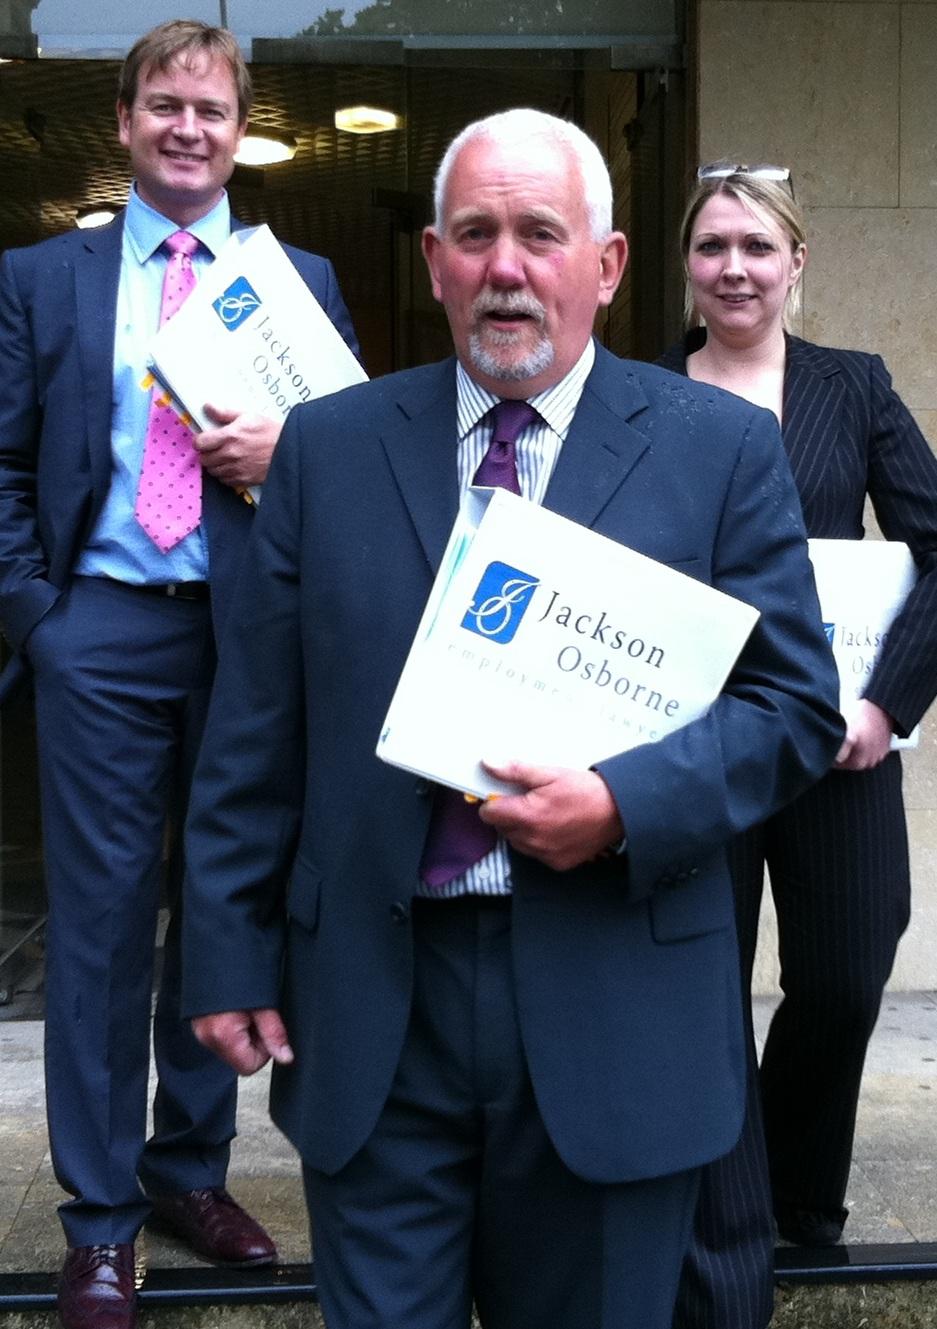 Jackson Osborne Wins Record Discrimination Award